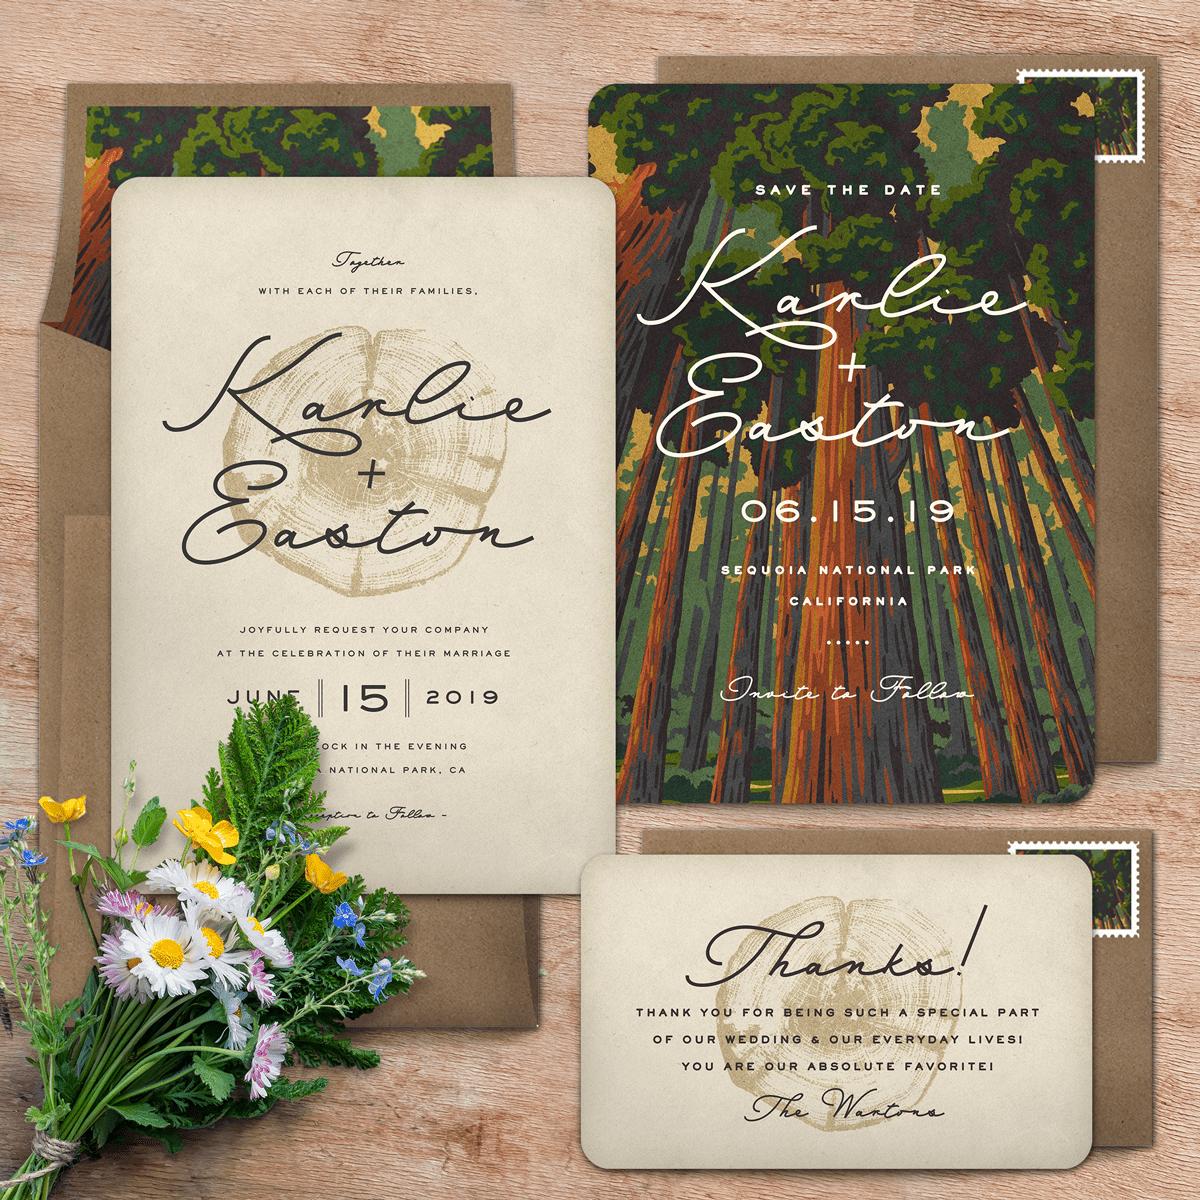 Wedding Invitations Eco Friendly: Introducing Greenvelope.com